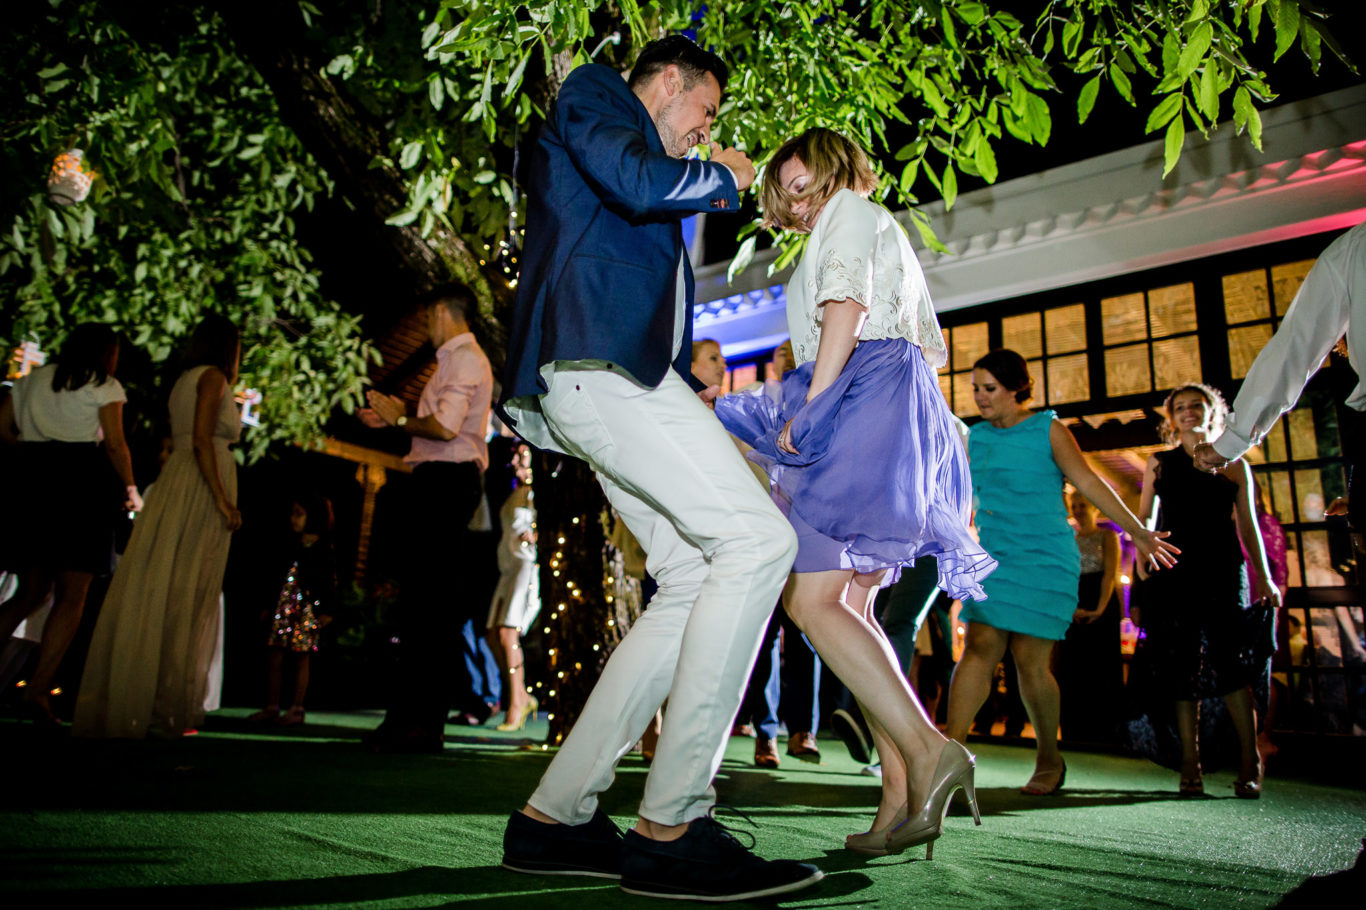 0697-fotoreportaj-nunta-conacul-maldar-cristina-stefan-fotograf-ciprian-dumitrescu-dc1_3149